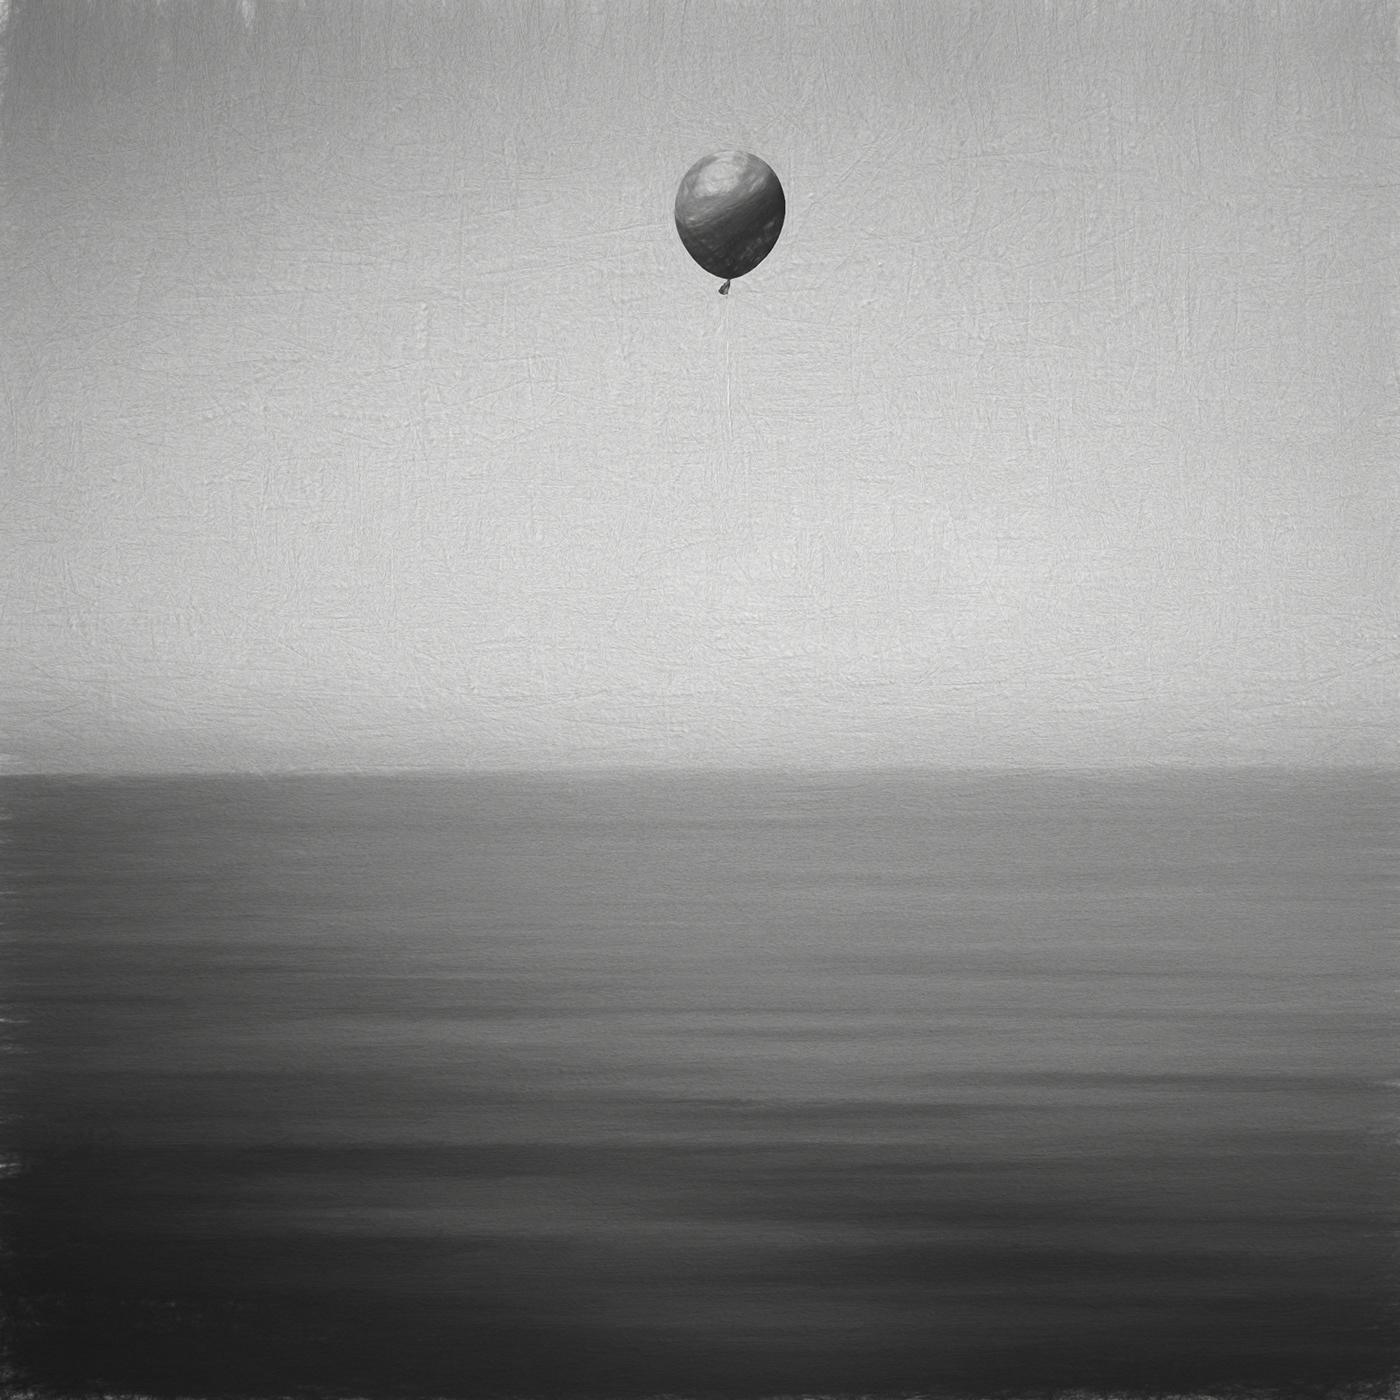 aDIEU L'ami bnw Drawing  FAREWELL TO FRIEND monochrome NVENTFISCHER Ocean